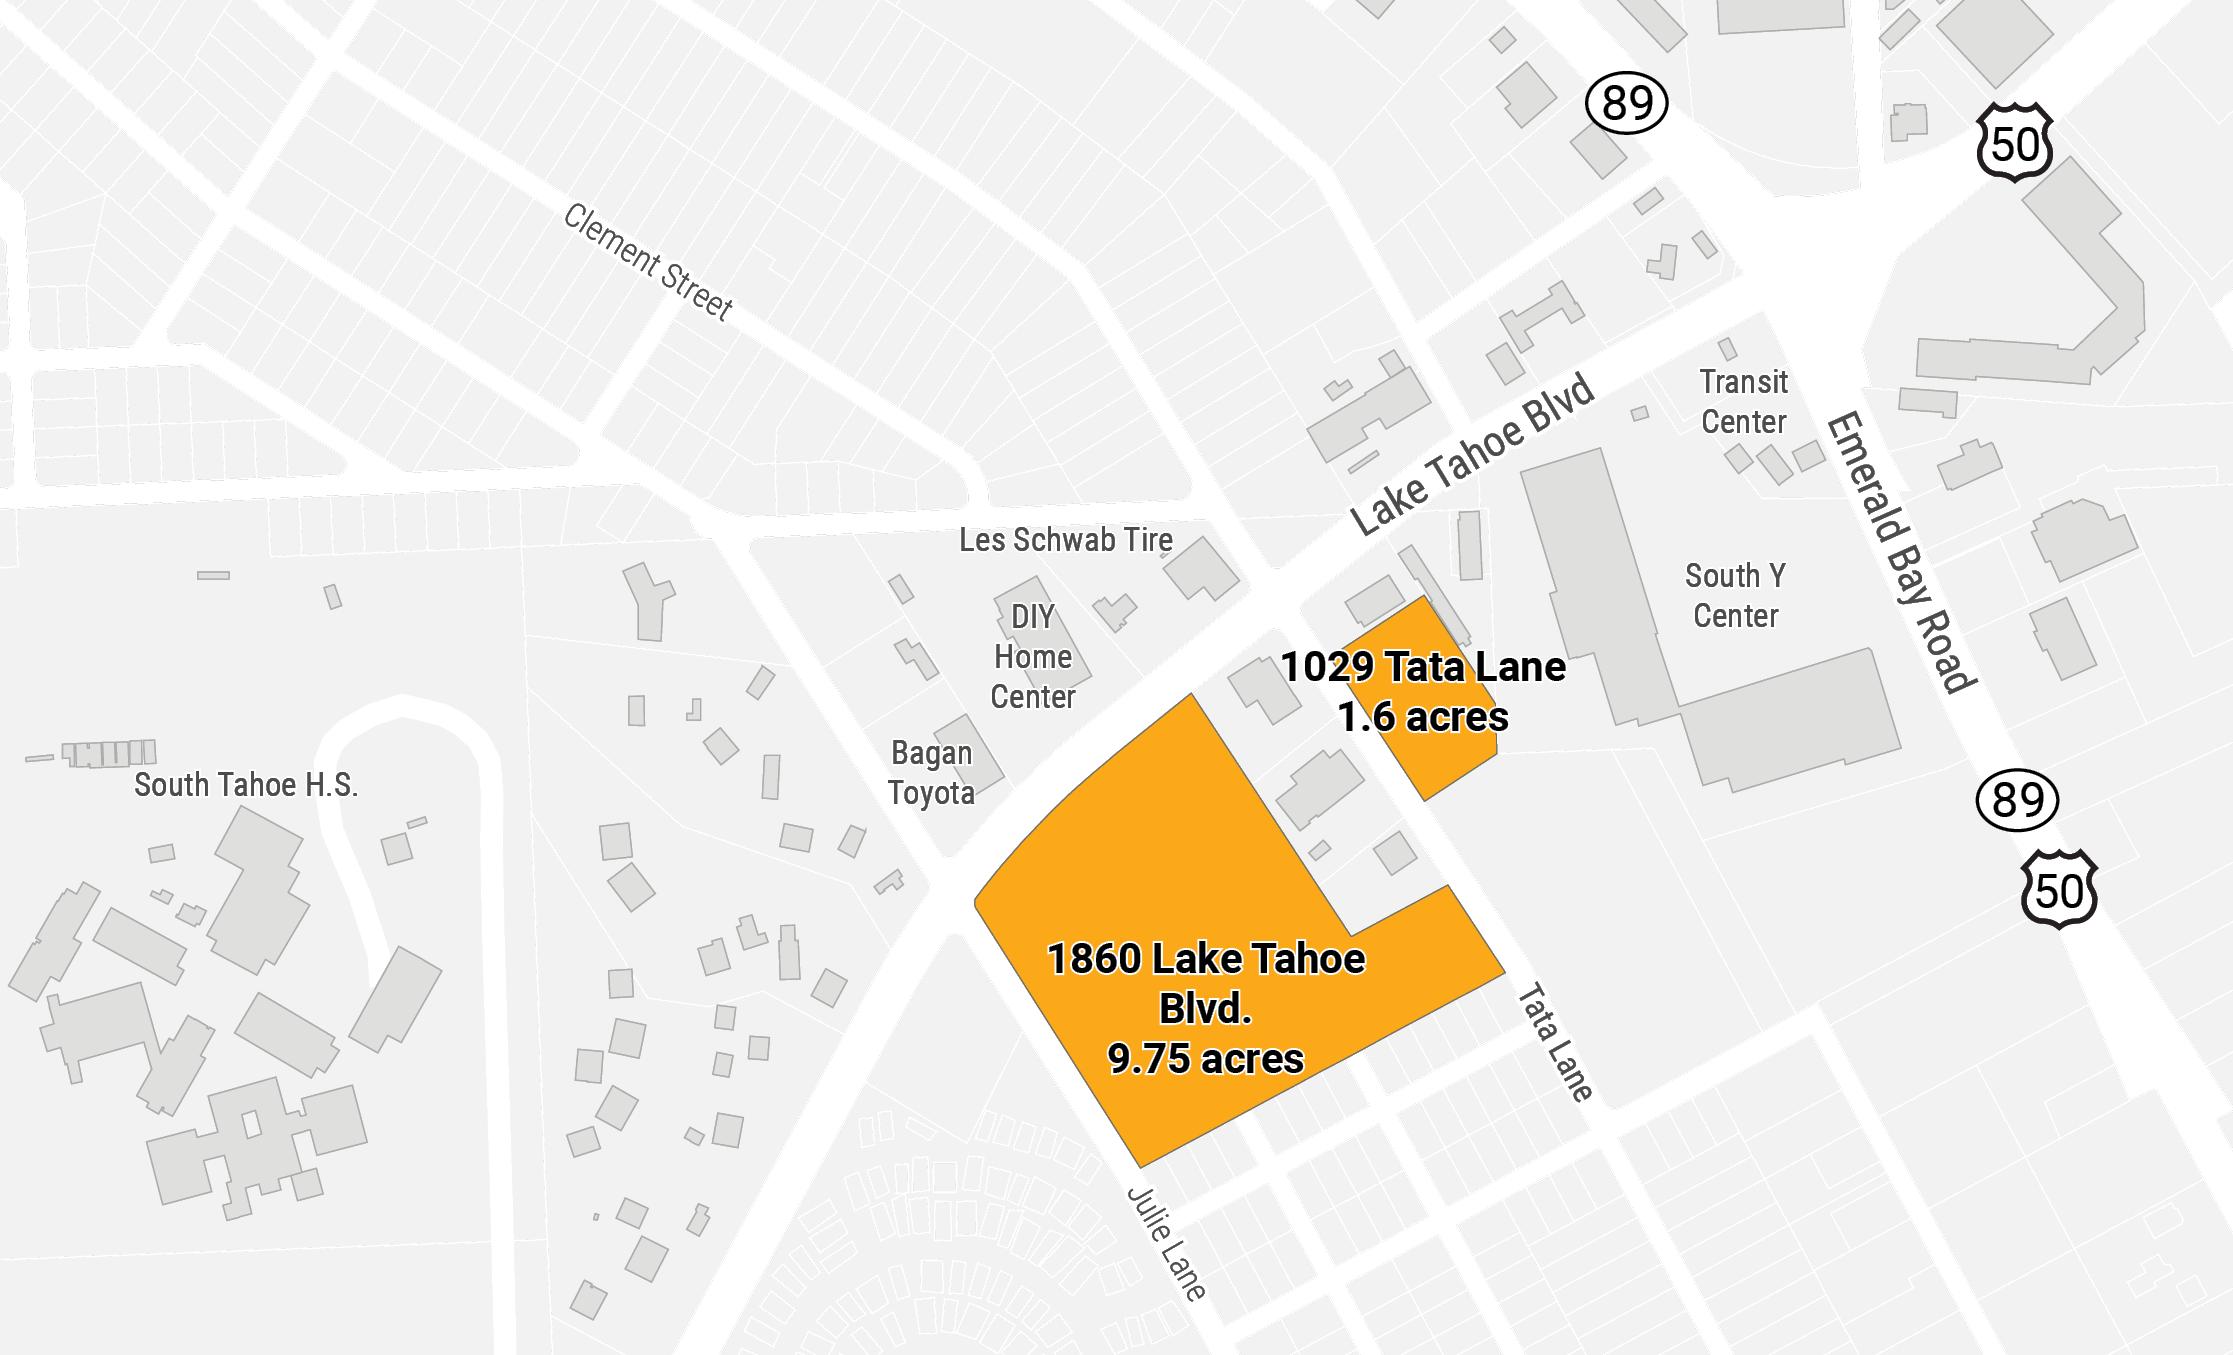 Asset lands near South Tahoe Y Area